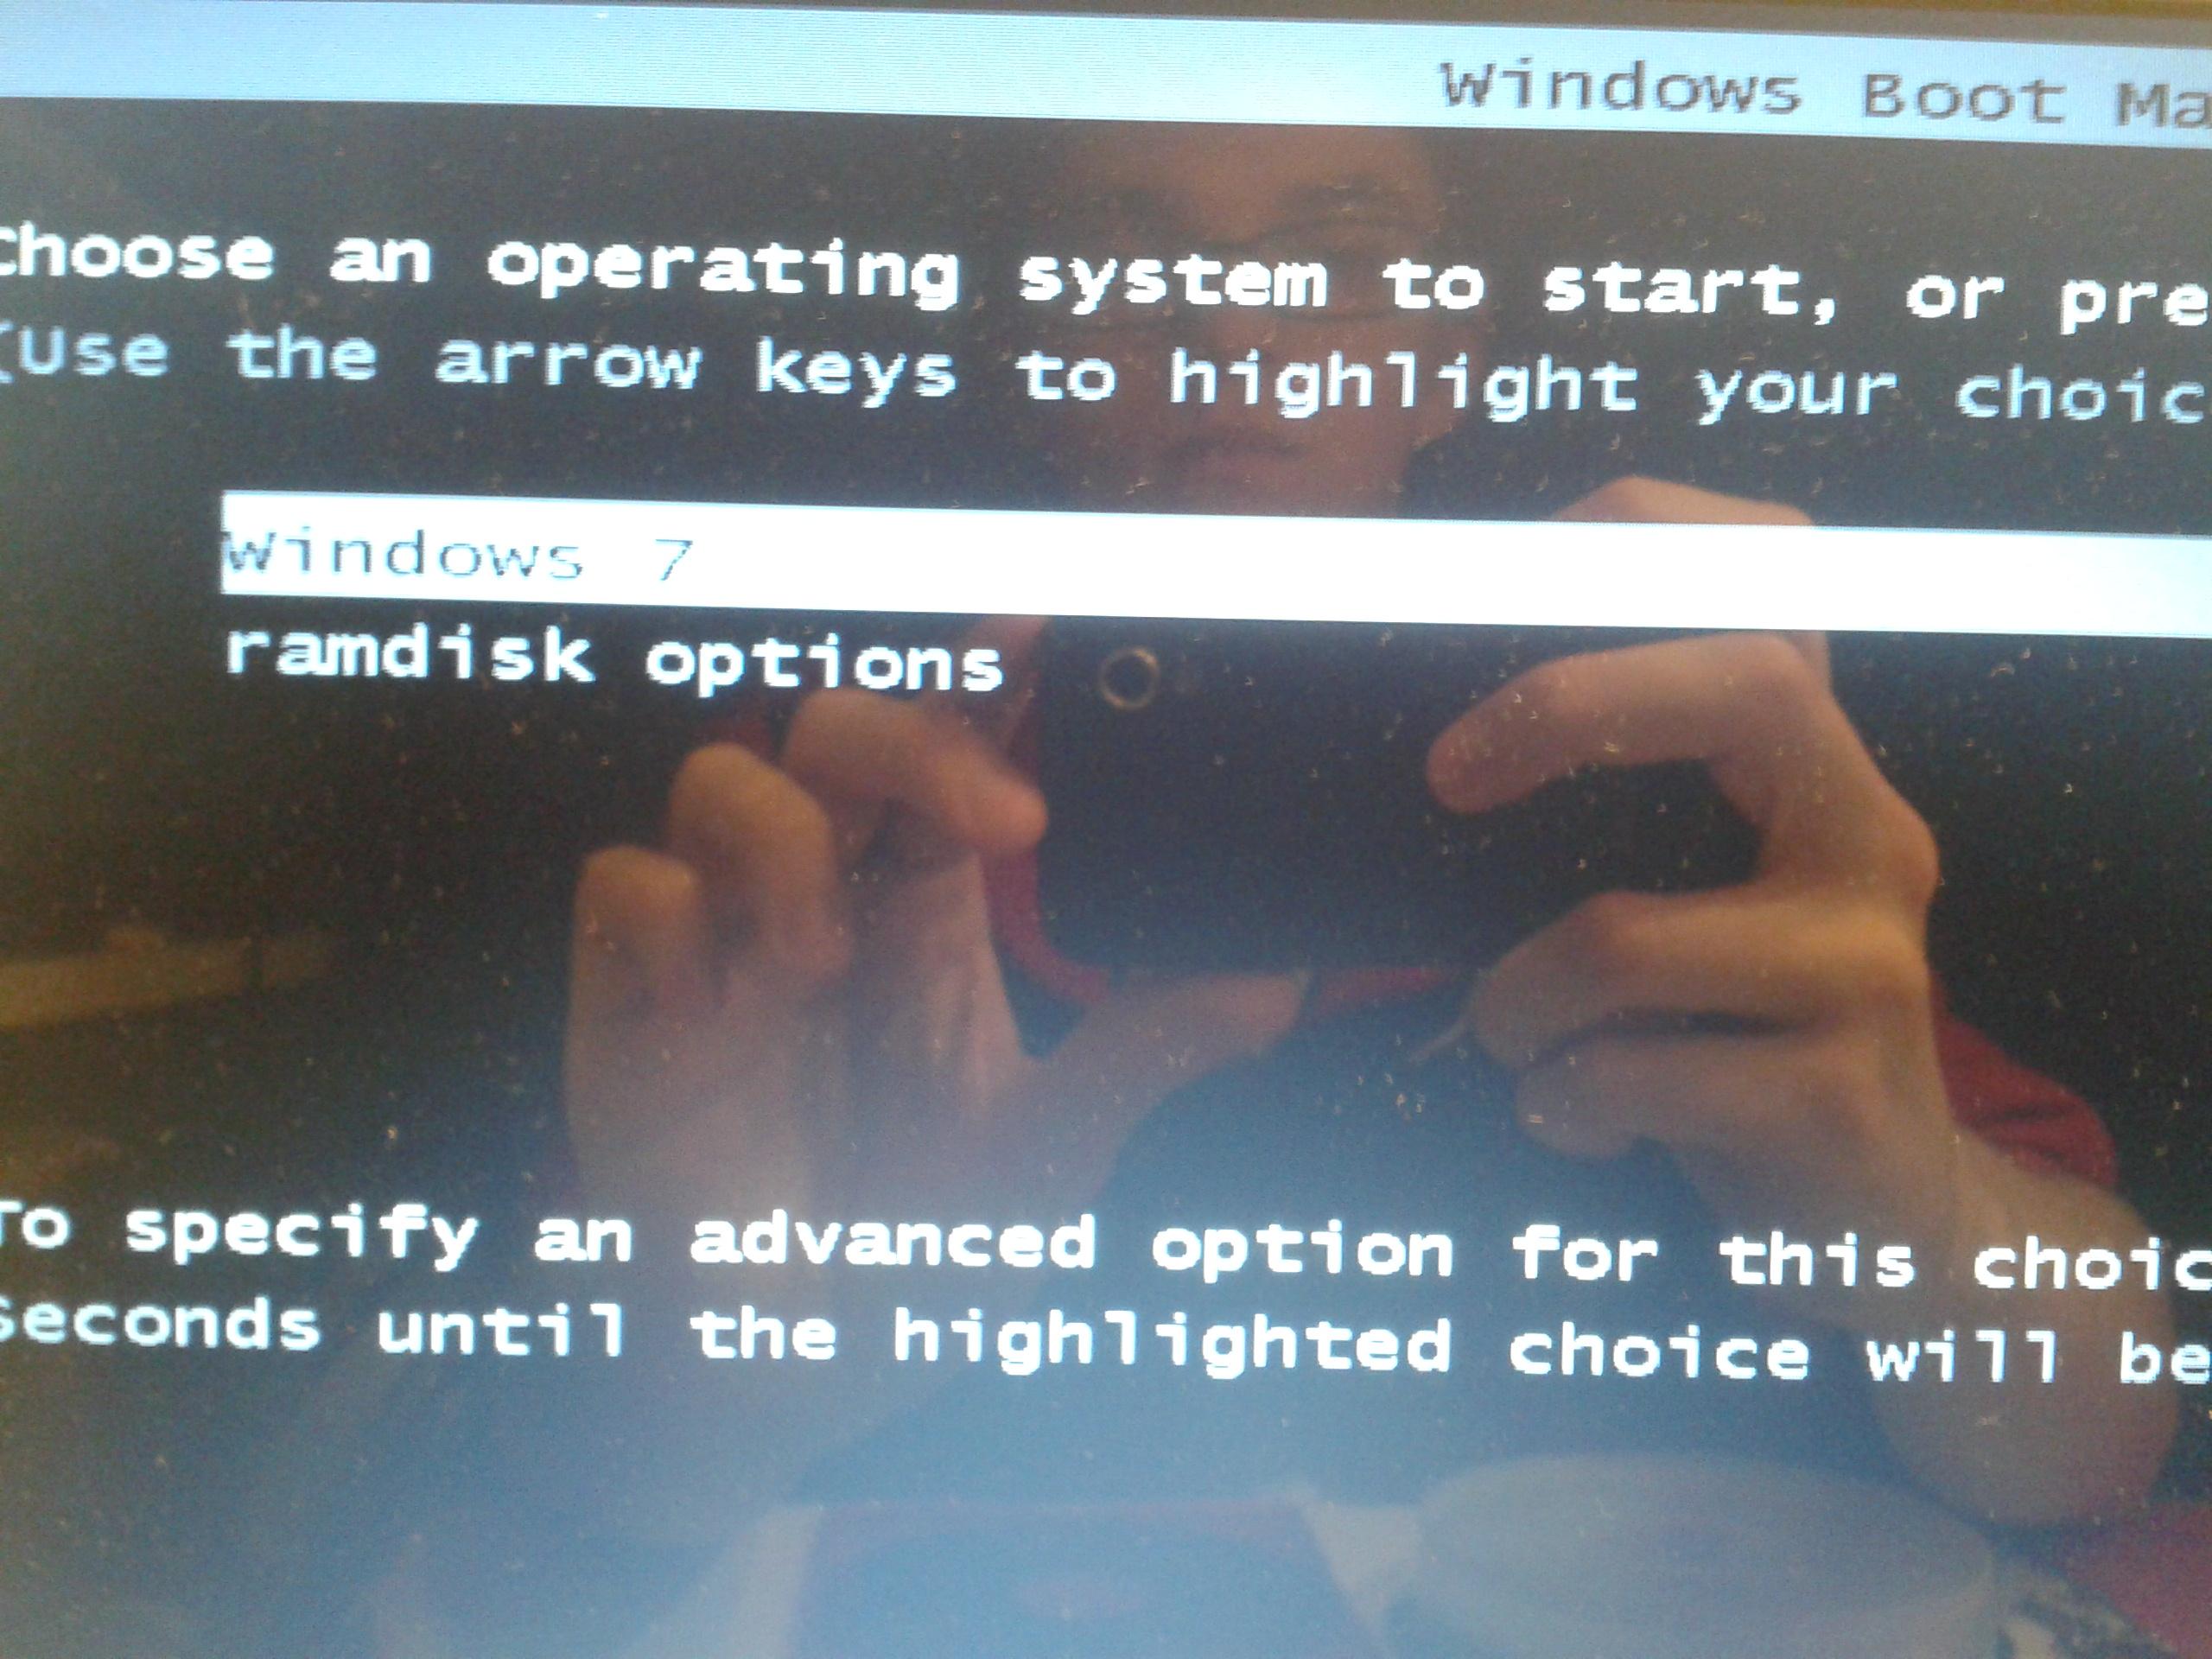 Dell XPS 15z - Brak DataSafe Local Backup pomimo instalacji